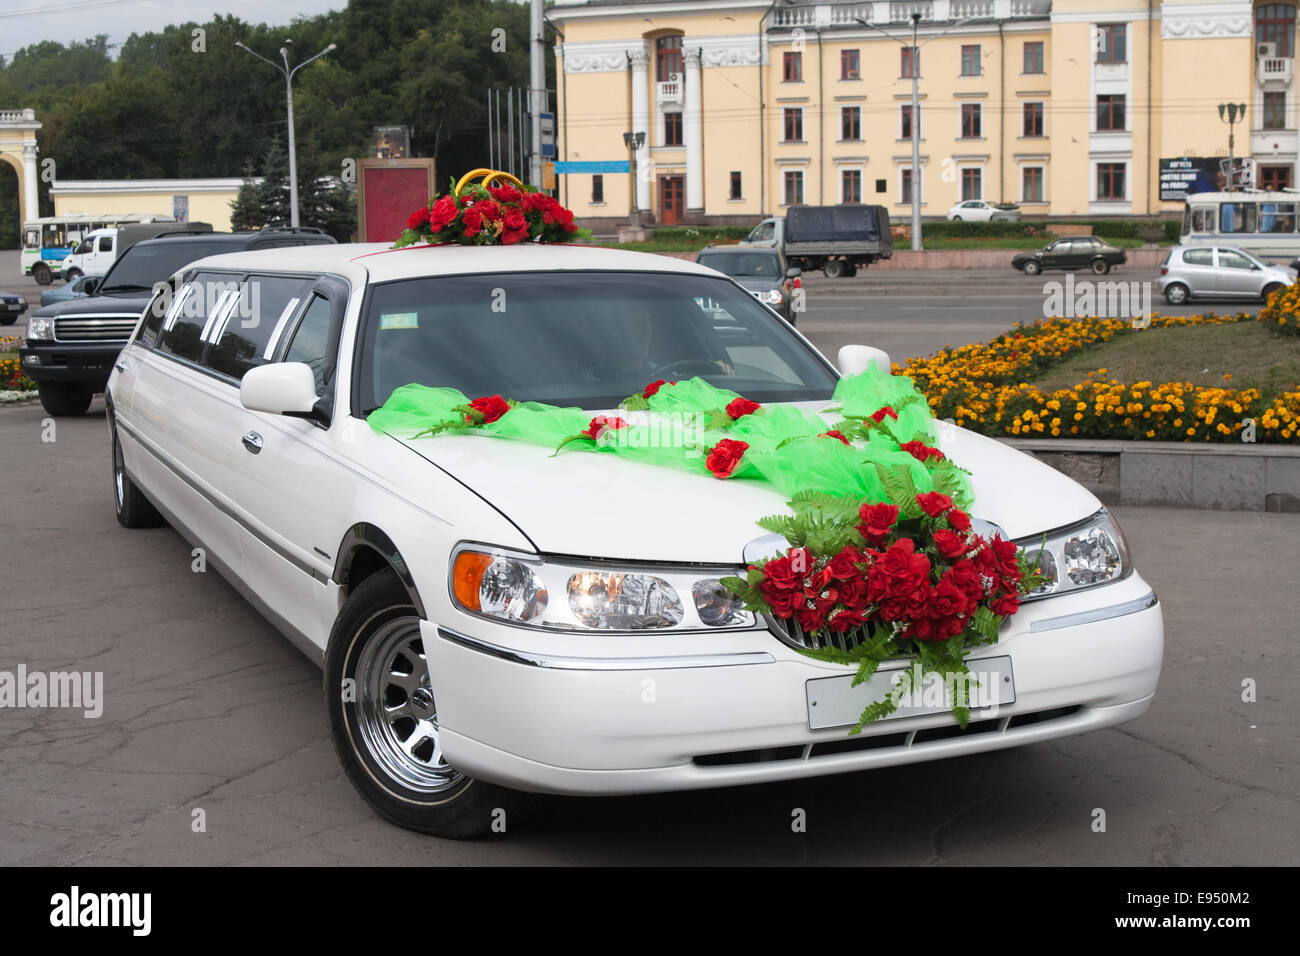 Wedding limousine - Stock Image